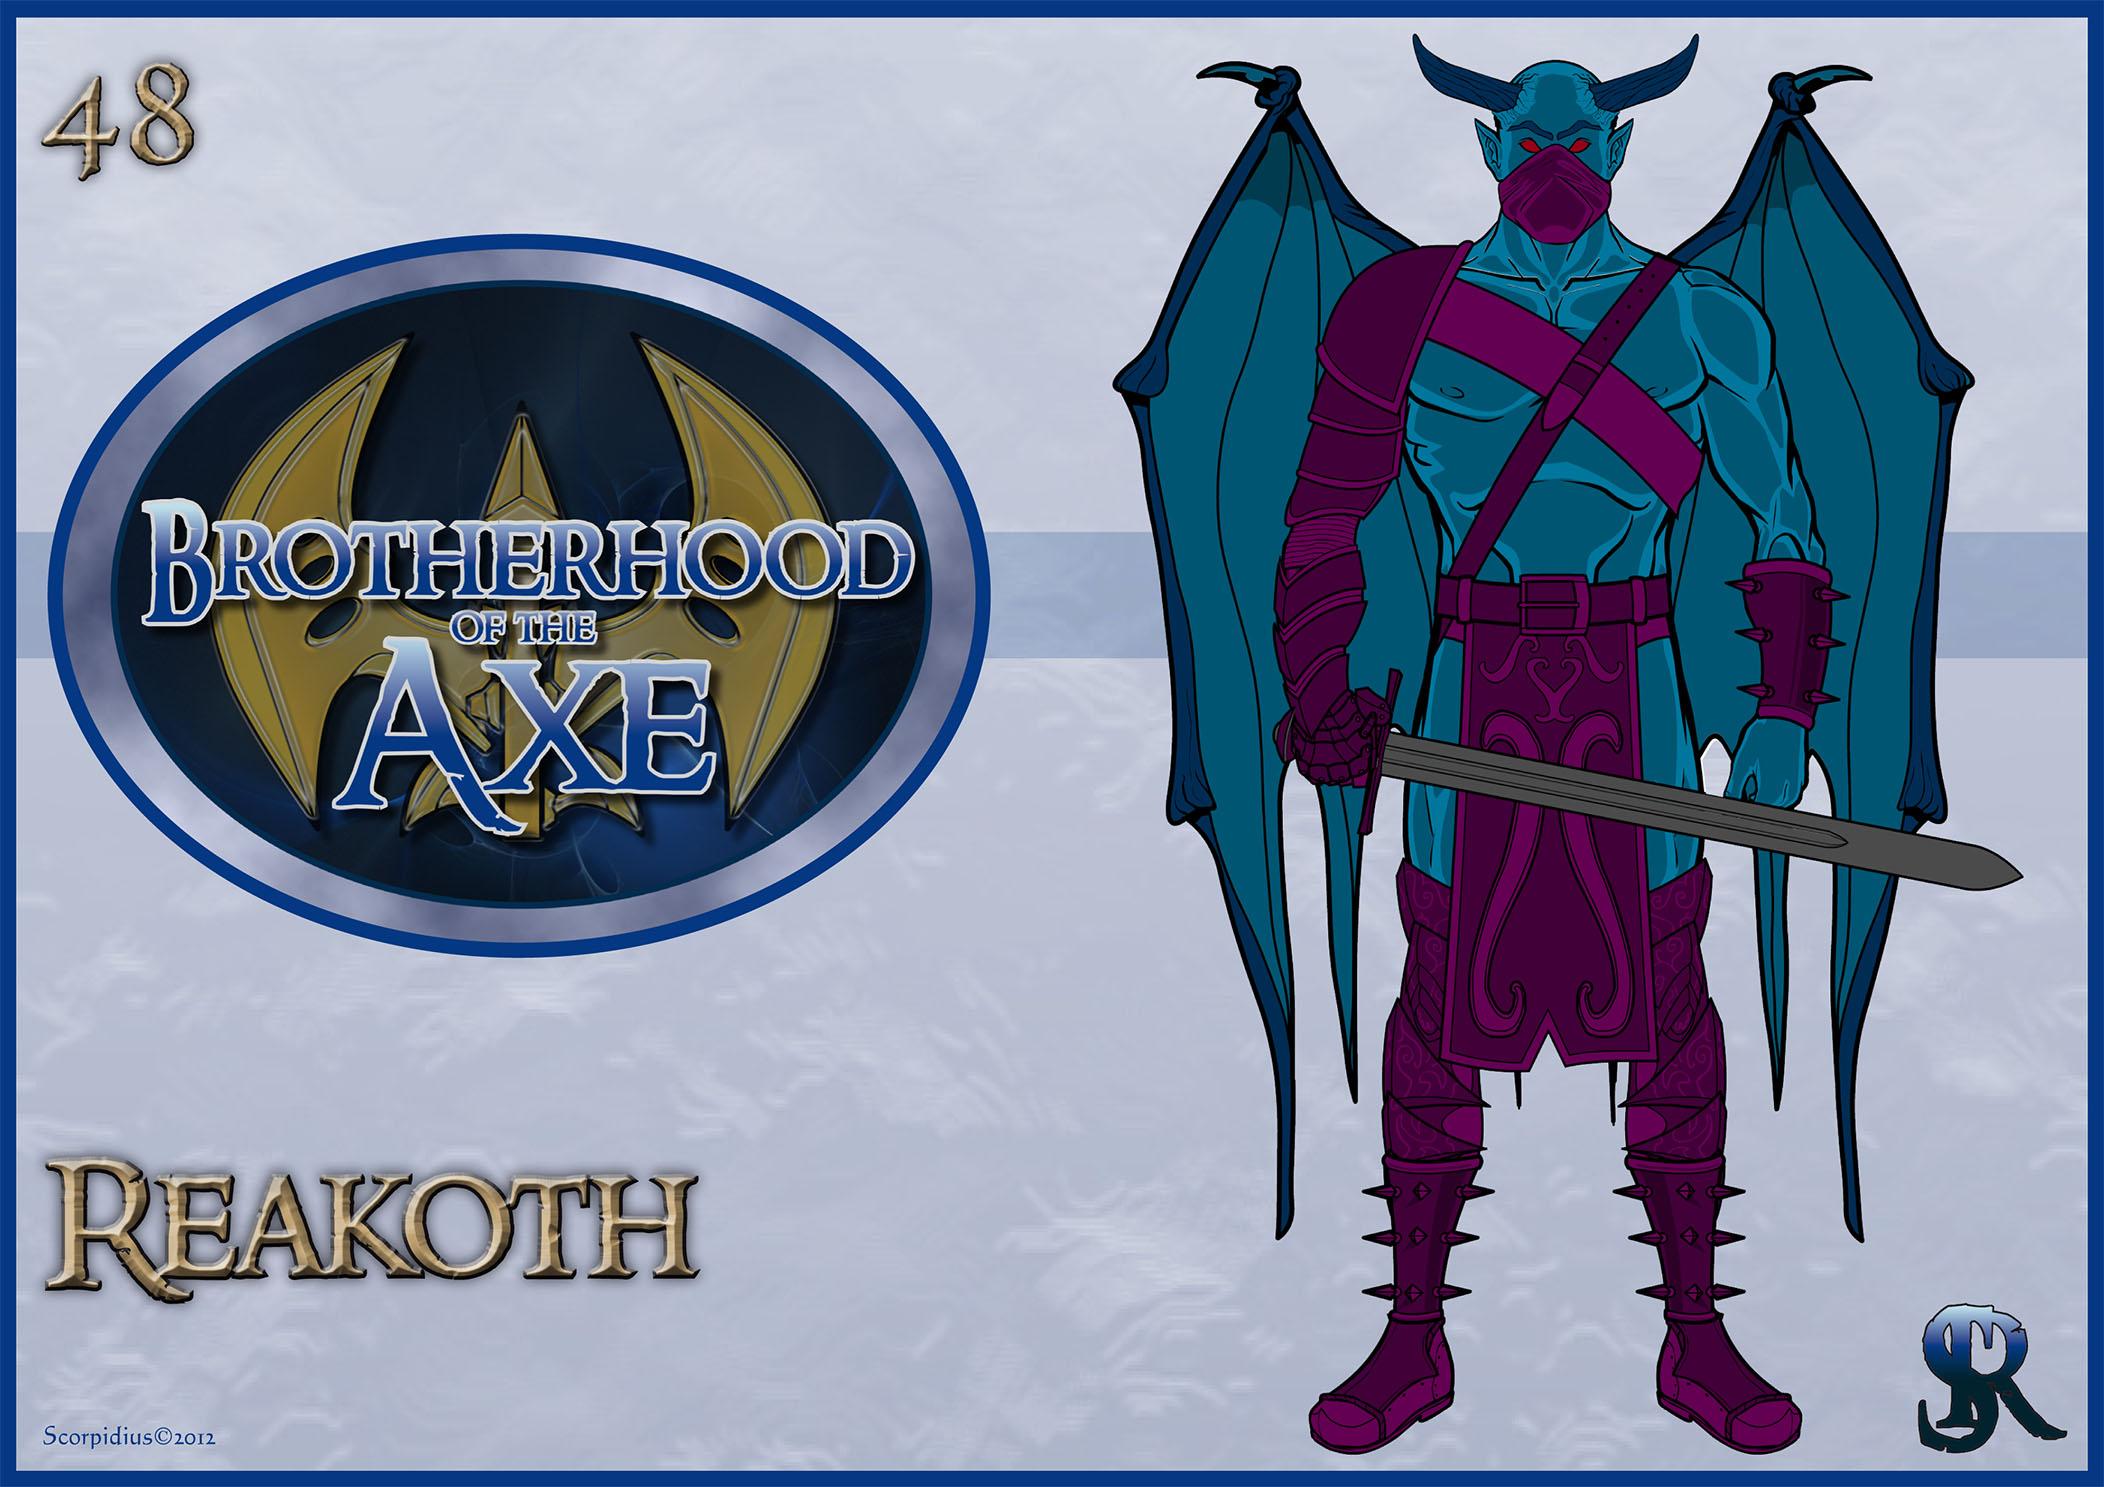 http://www.heromachine.com/wp-content/legacy/forum-image-uploads/scorpidius/2012/03/048-Reakoth-2.jpg